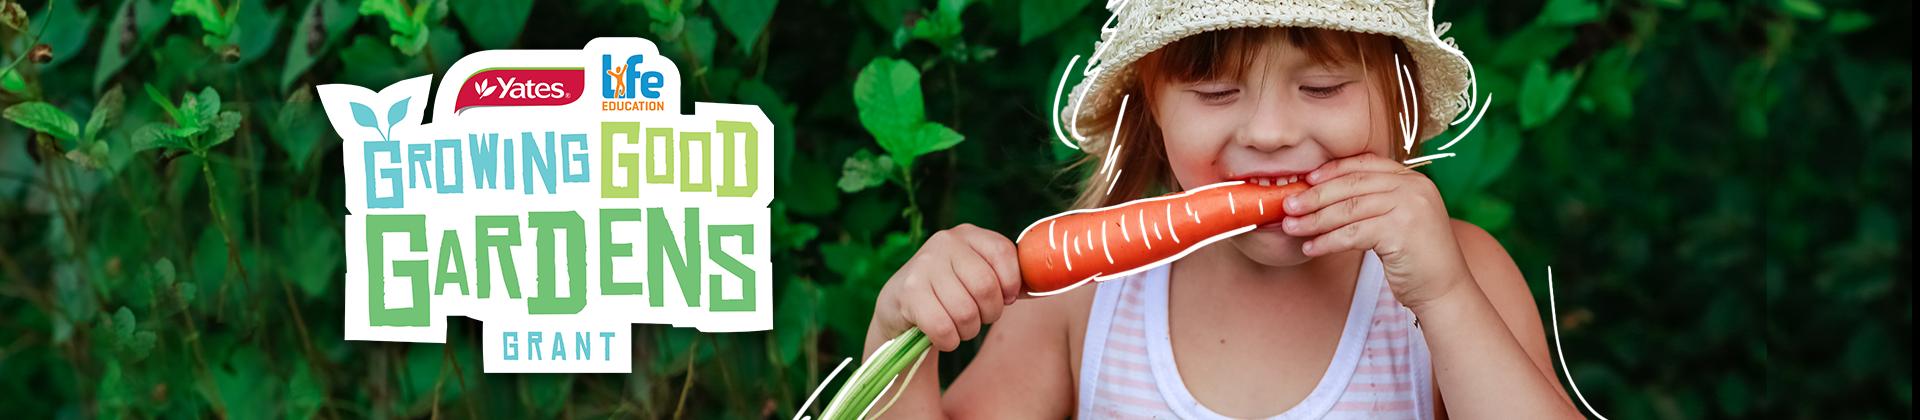 growing-good-gardens-grant-banner